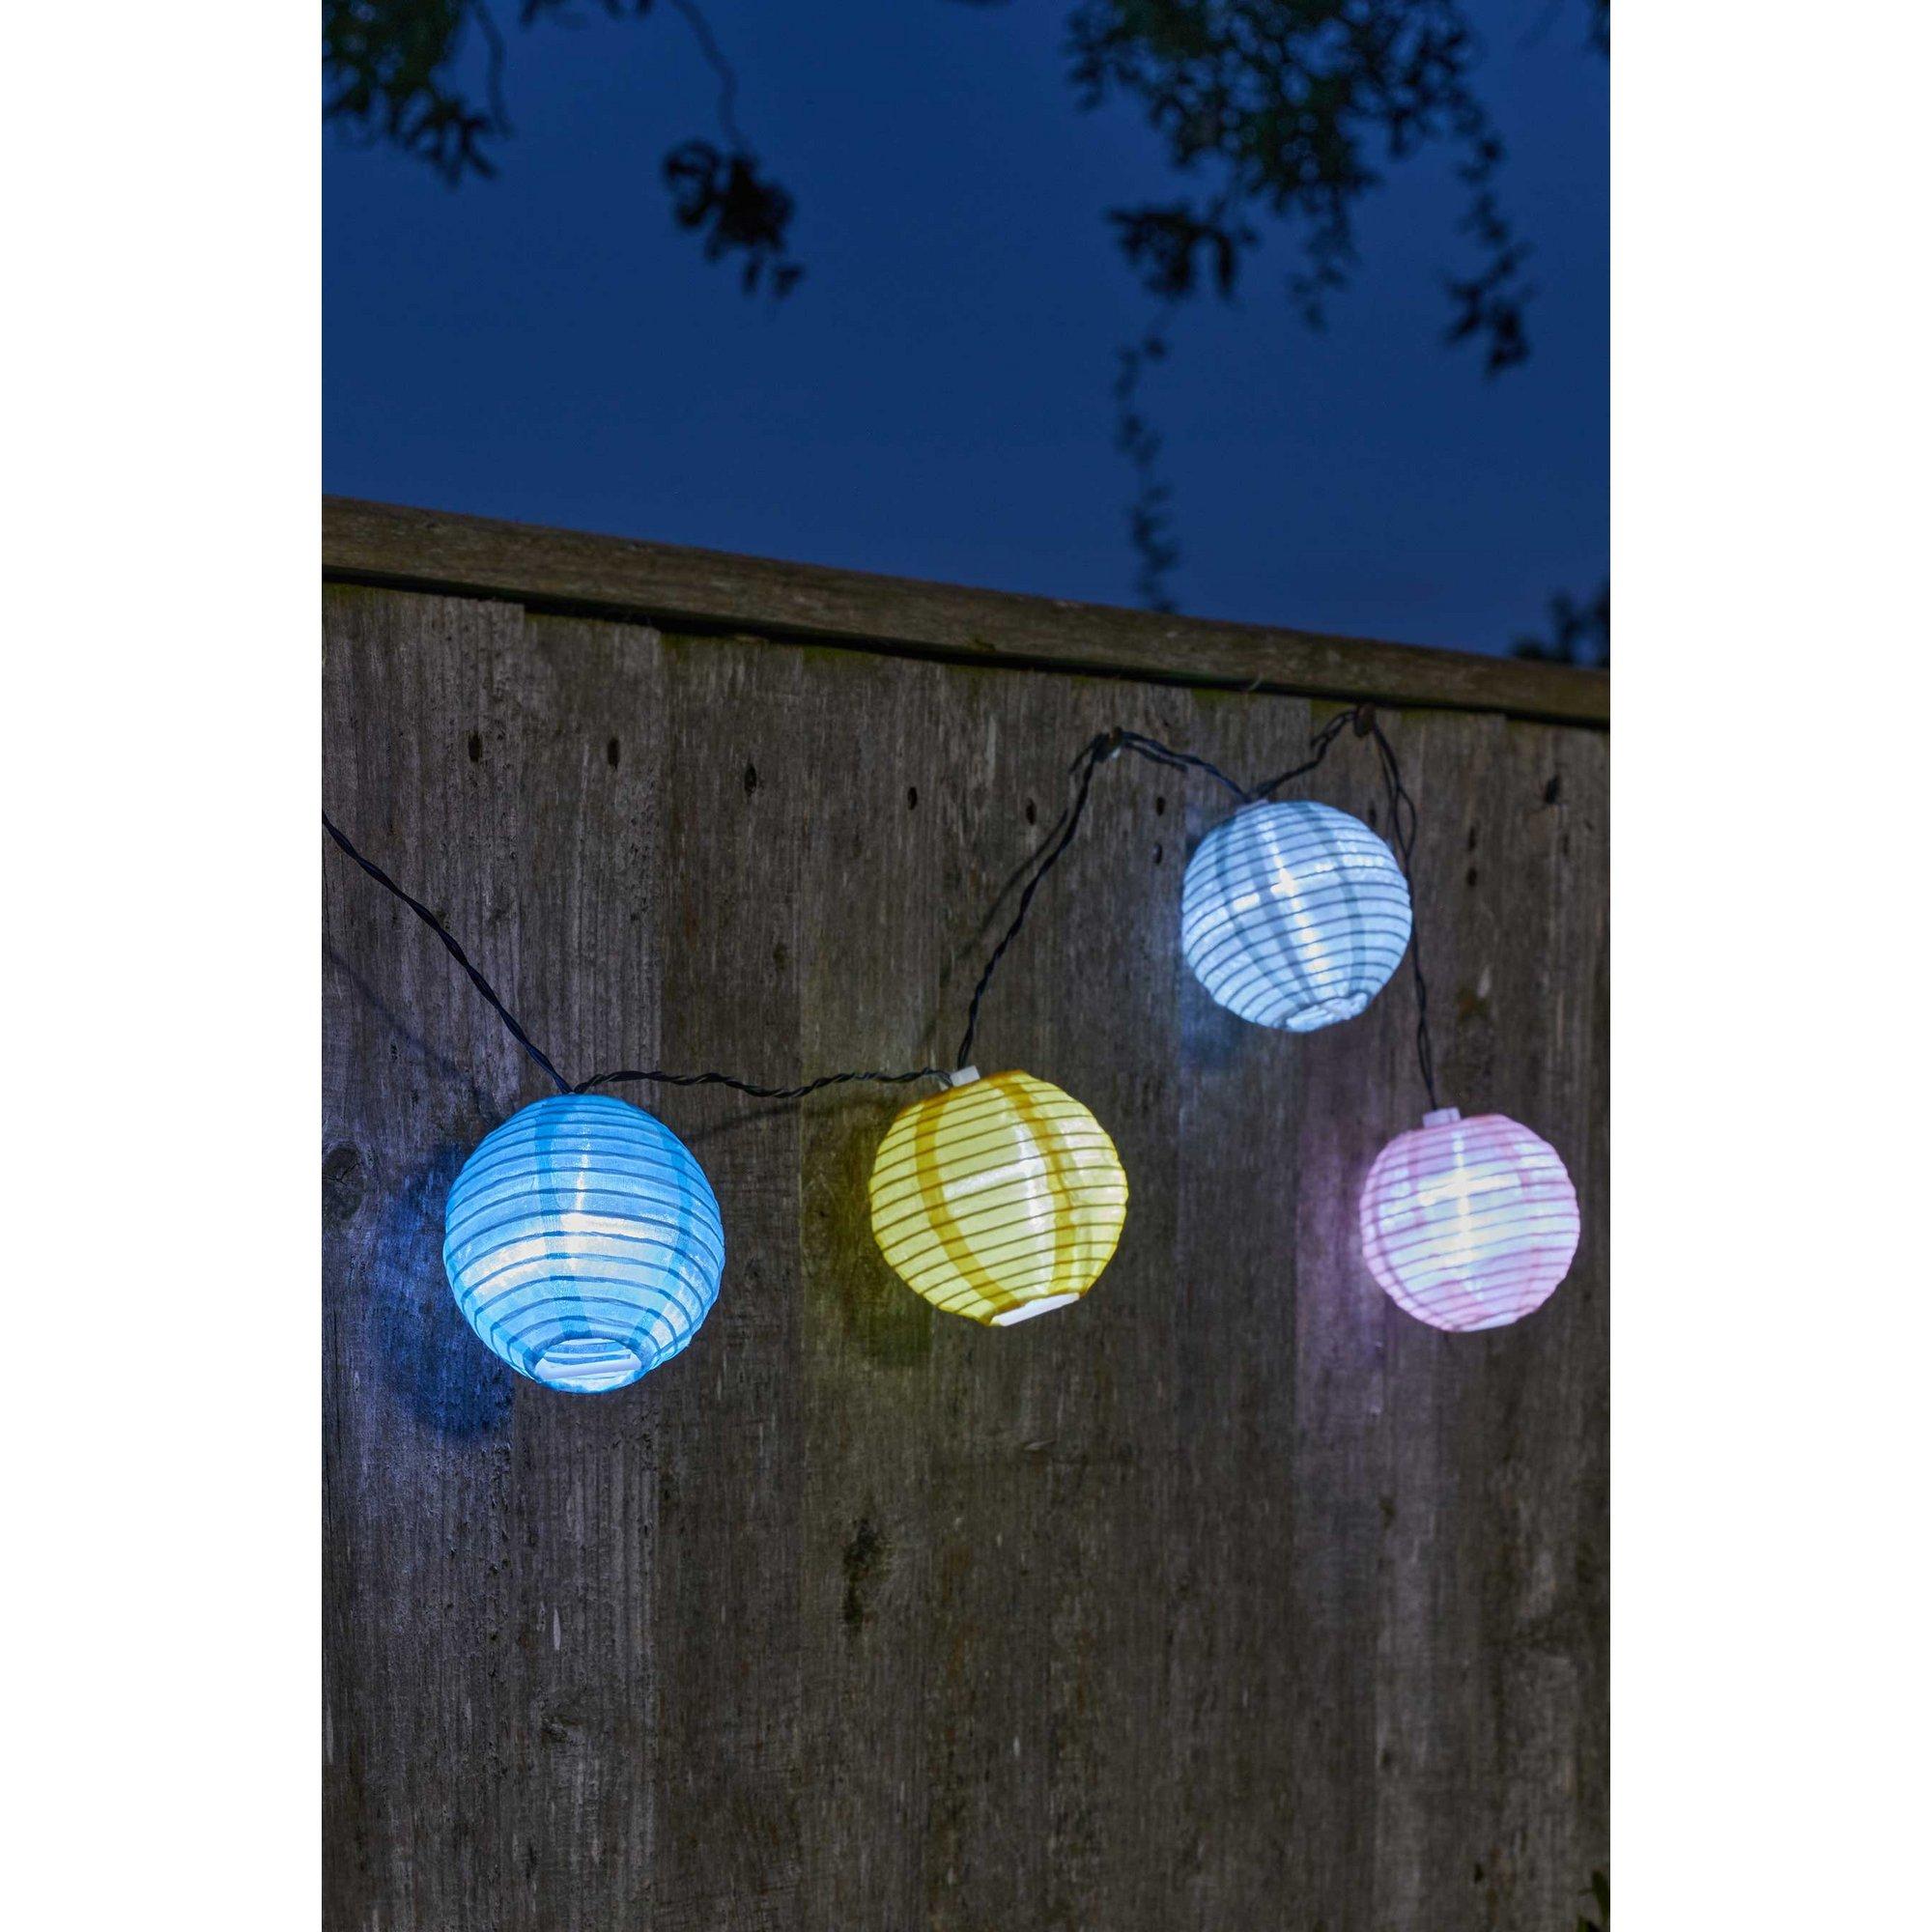 Image of 10 Solar Chinese Lanterns Dual LED String Lights